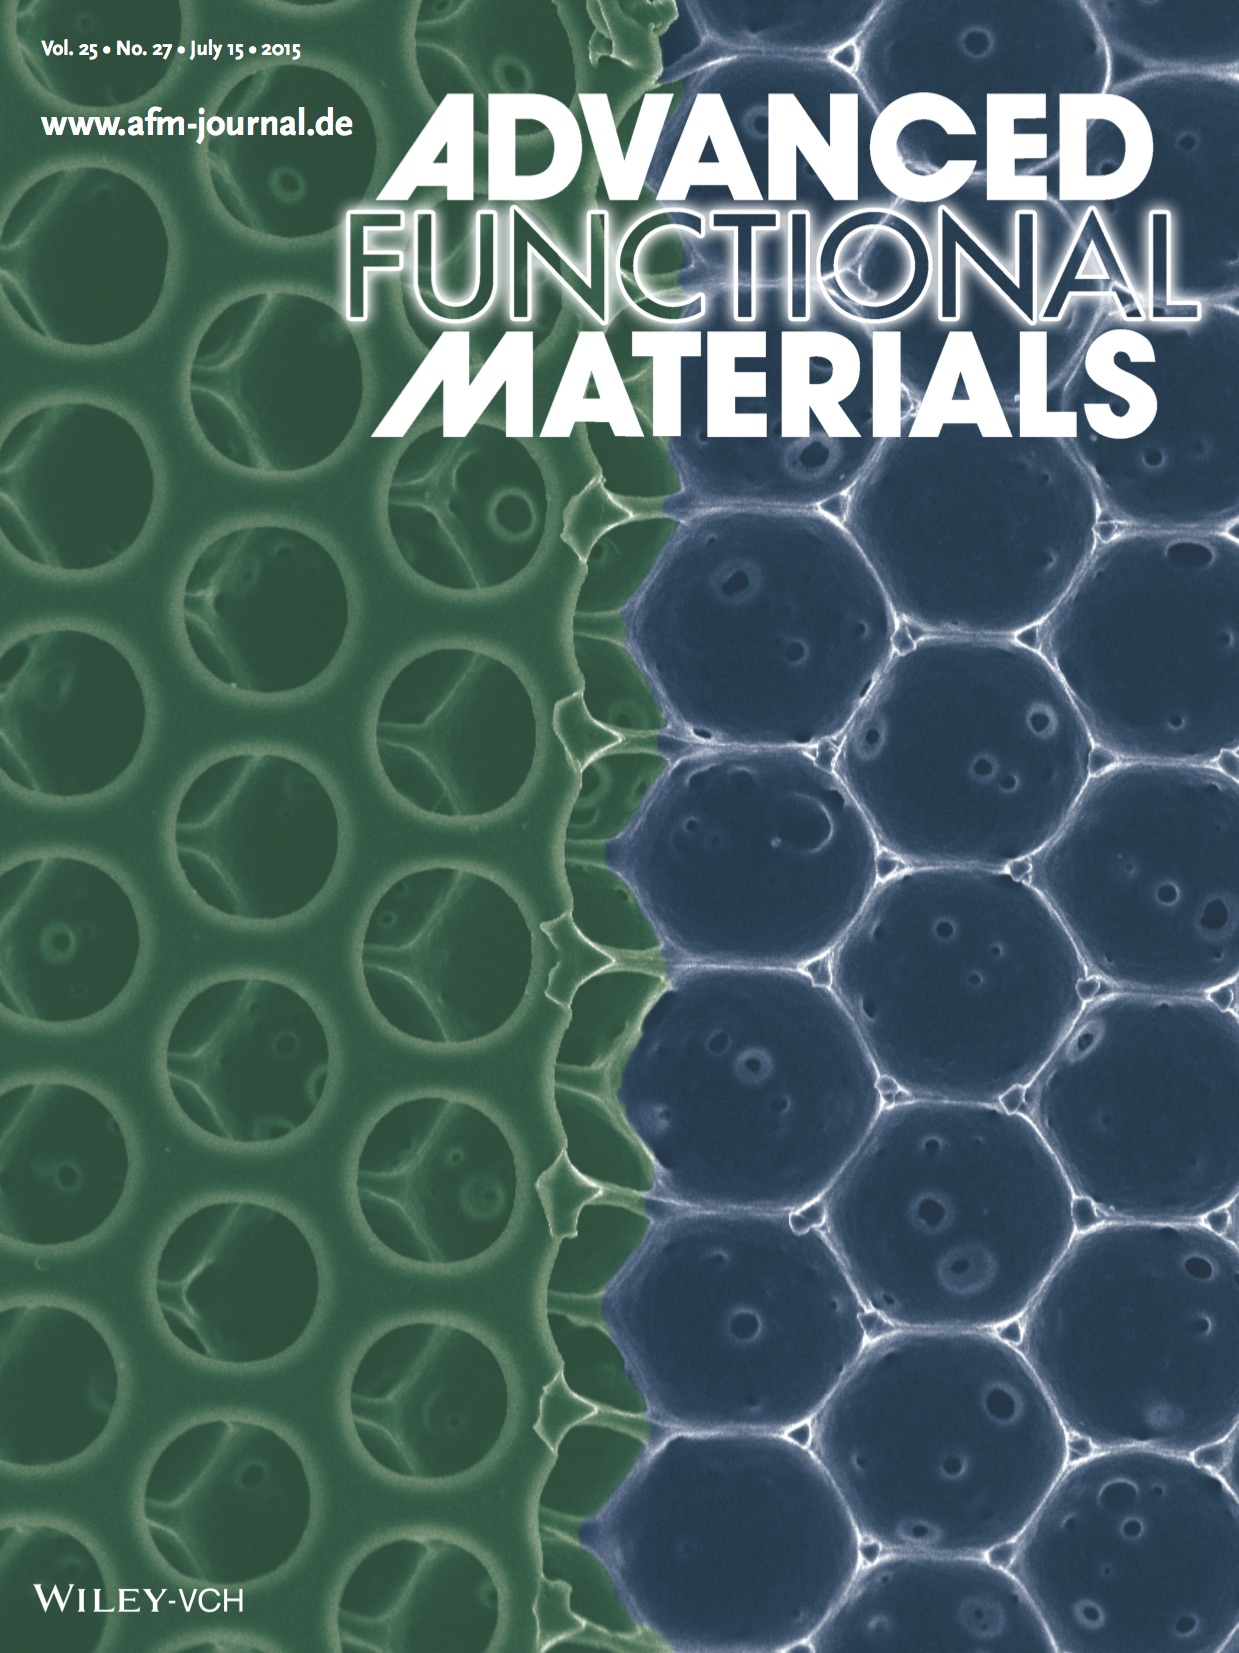 Kamei_et_al-2015-Advanced_Functional_Materials-2.jpg